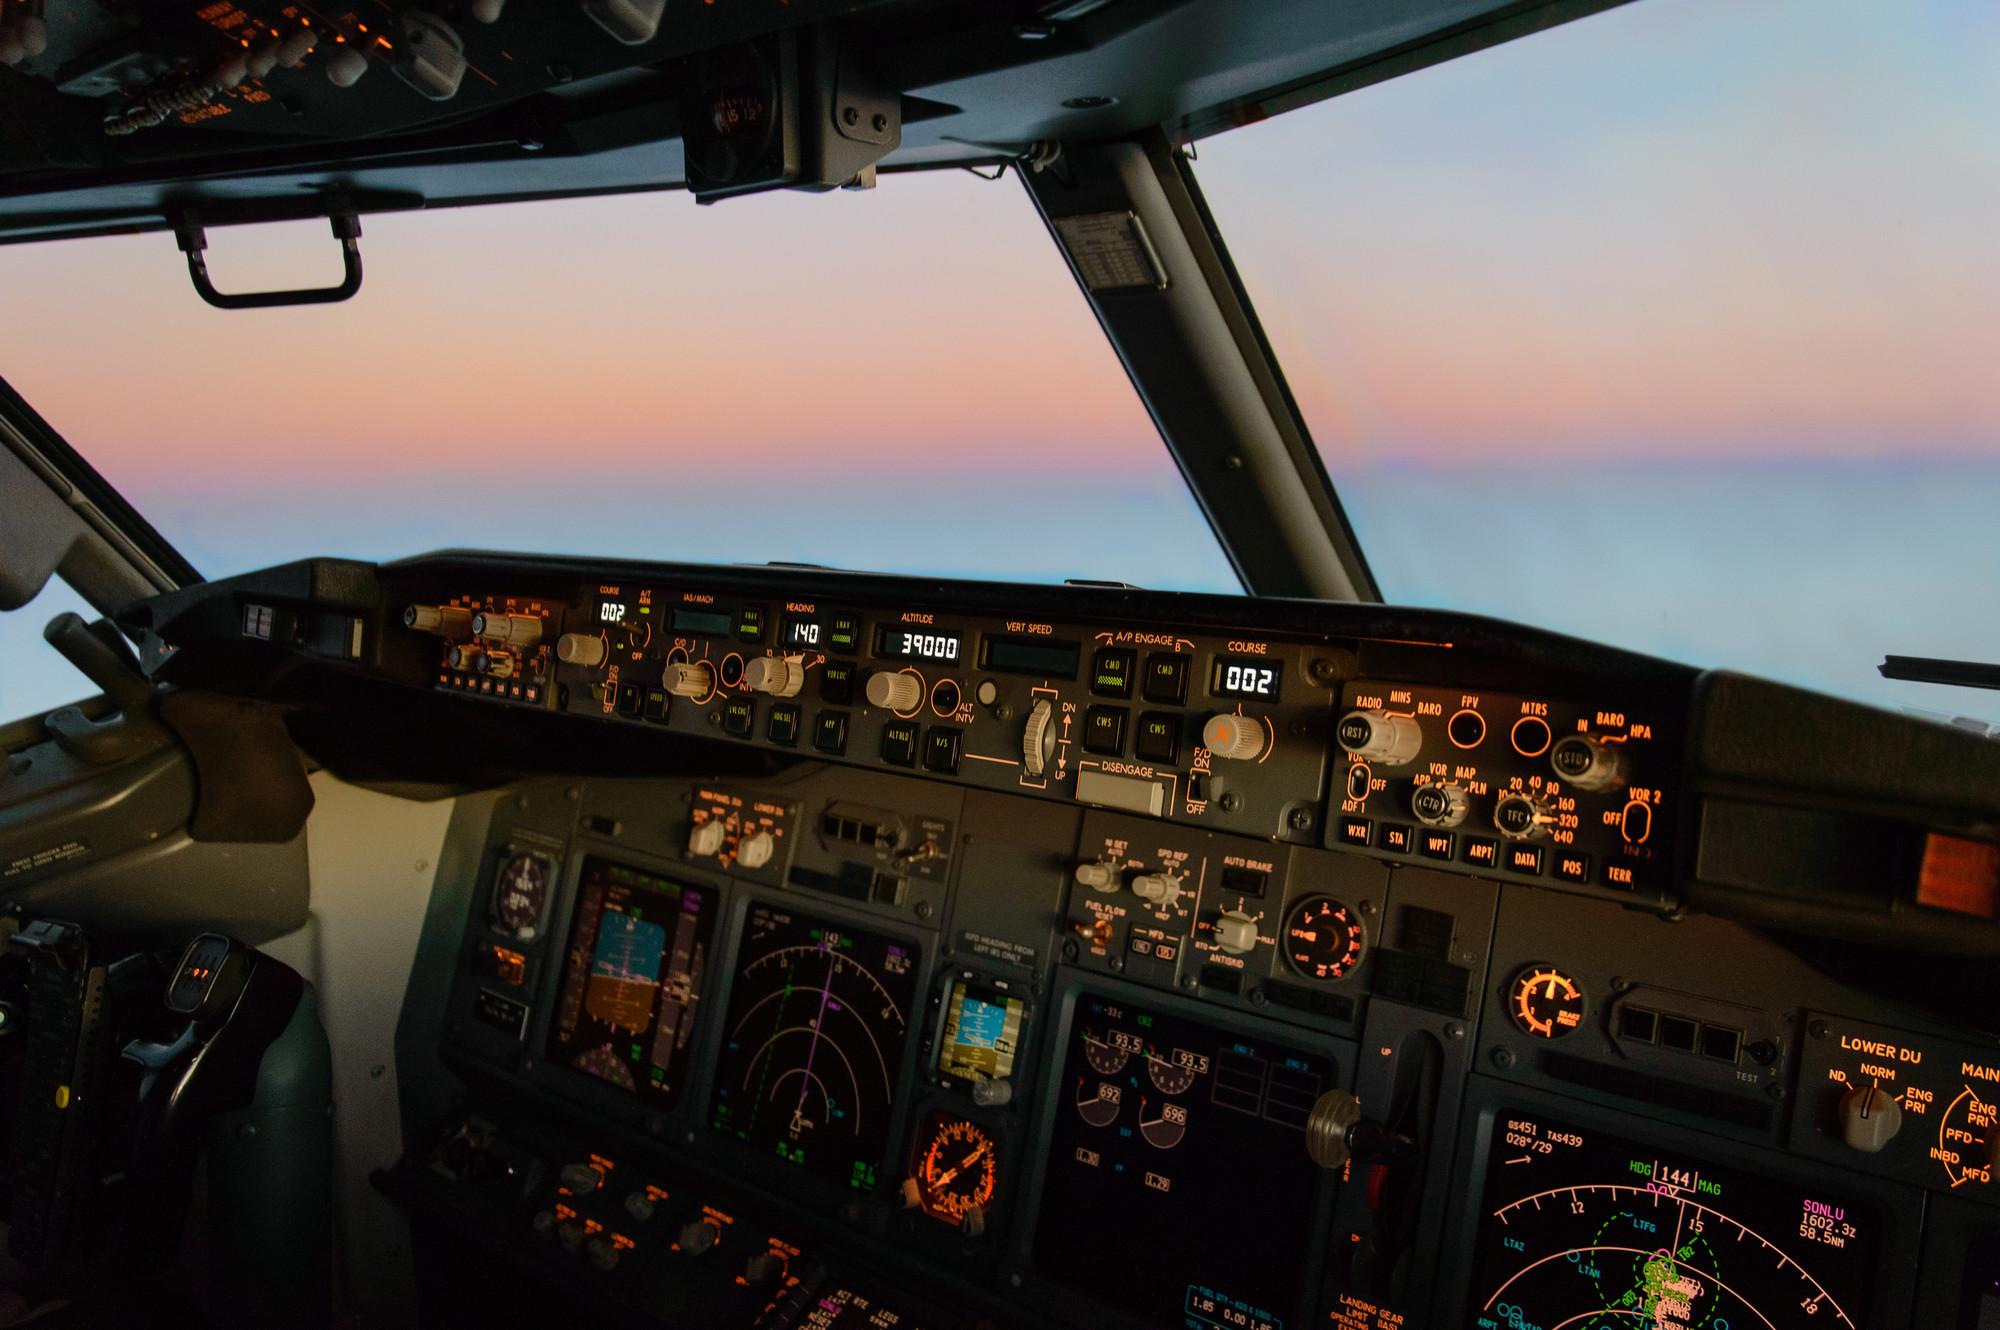 OZU flight simulator center